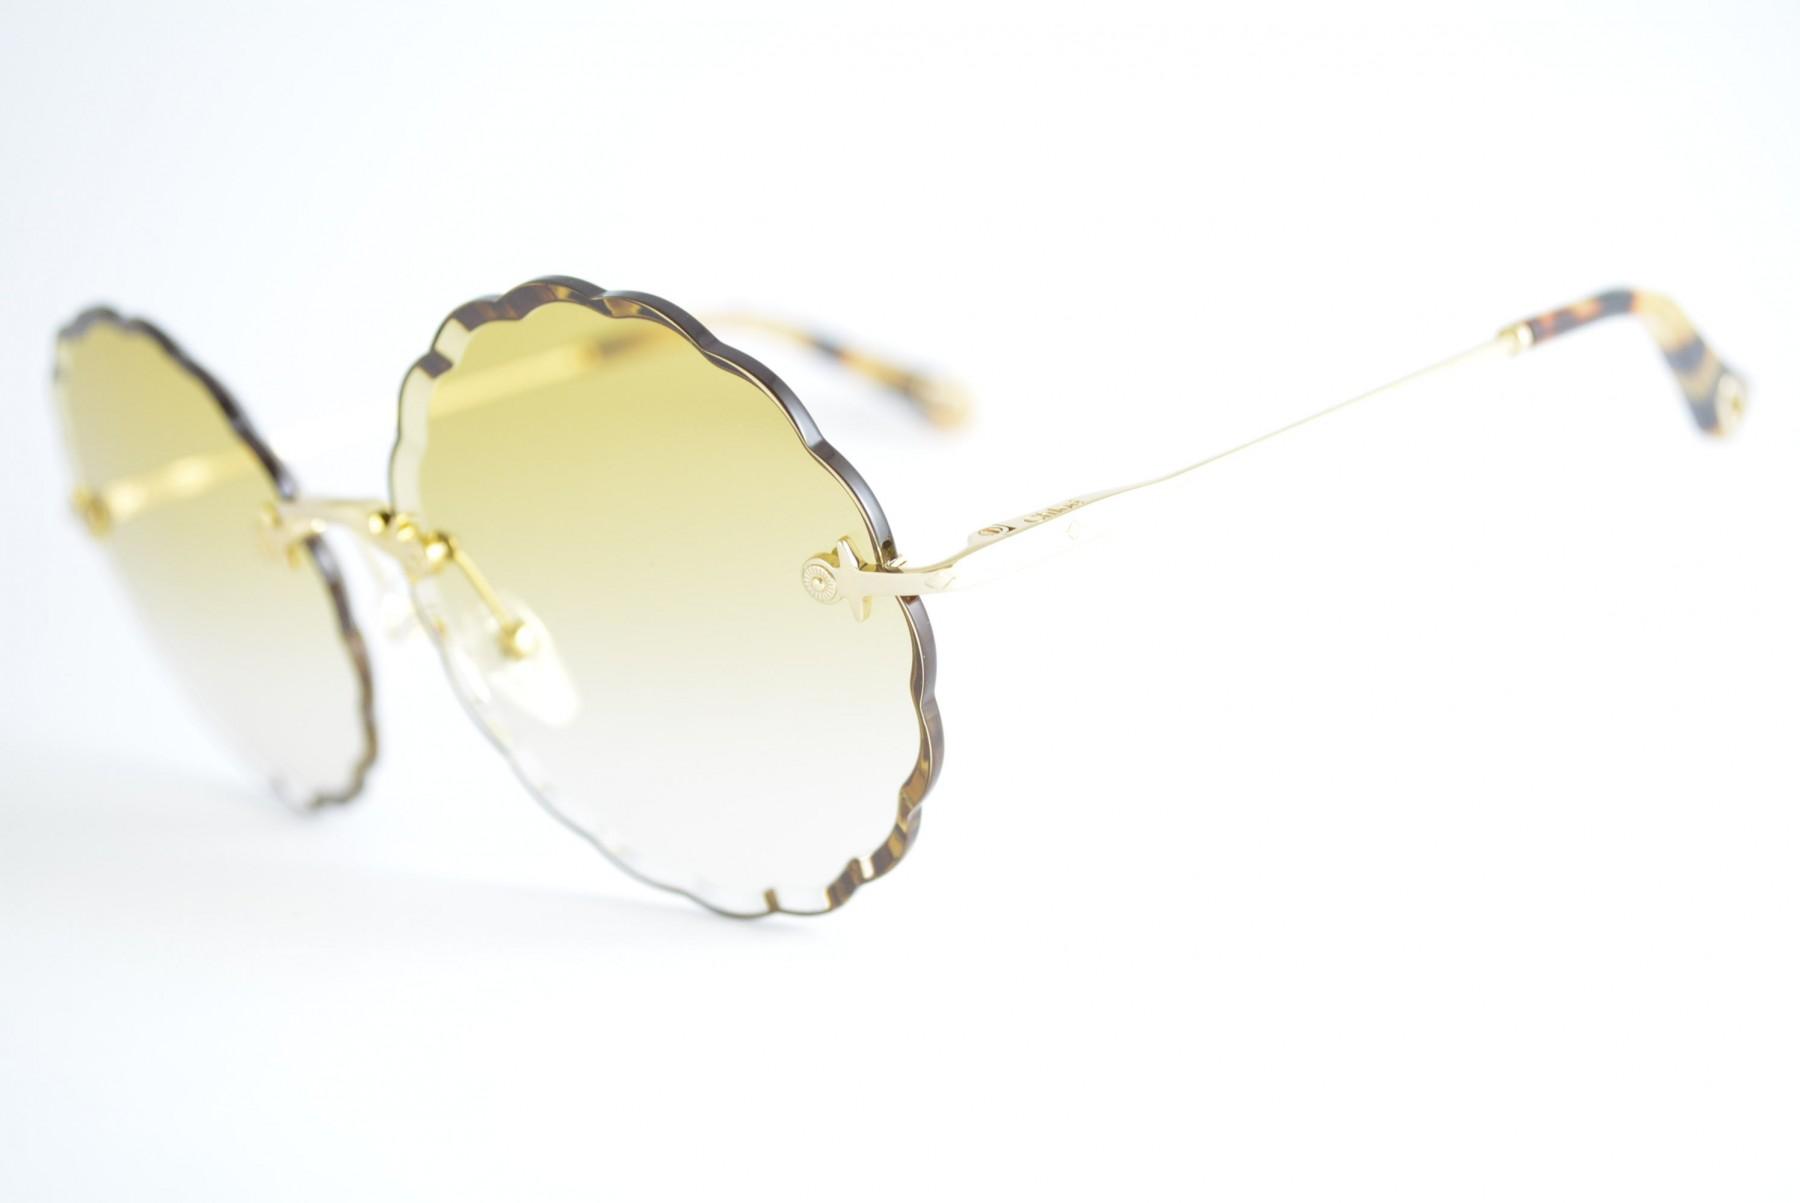 31d87a4ca óculos de sol Chloé Rosie mod ce142s 817. Código: ce142s 817